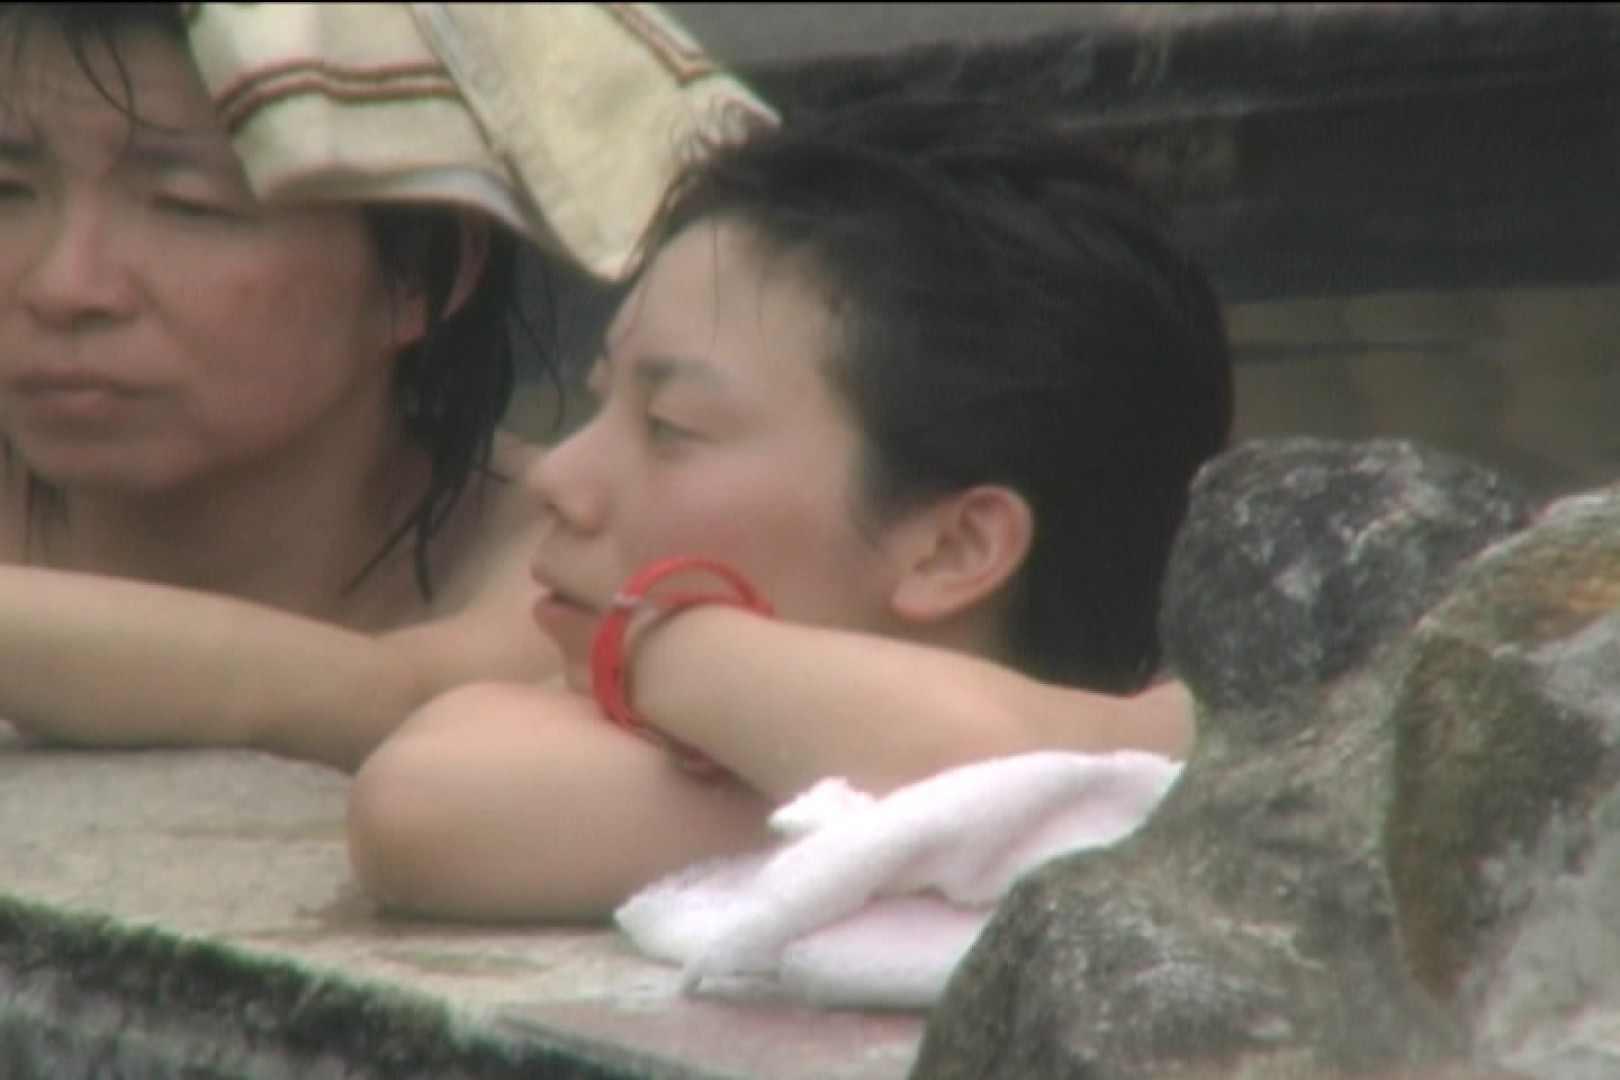 Aquaな露天風呂Vol.122 HなOL   0  107pic 33